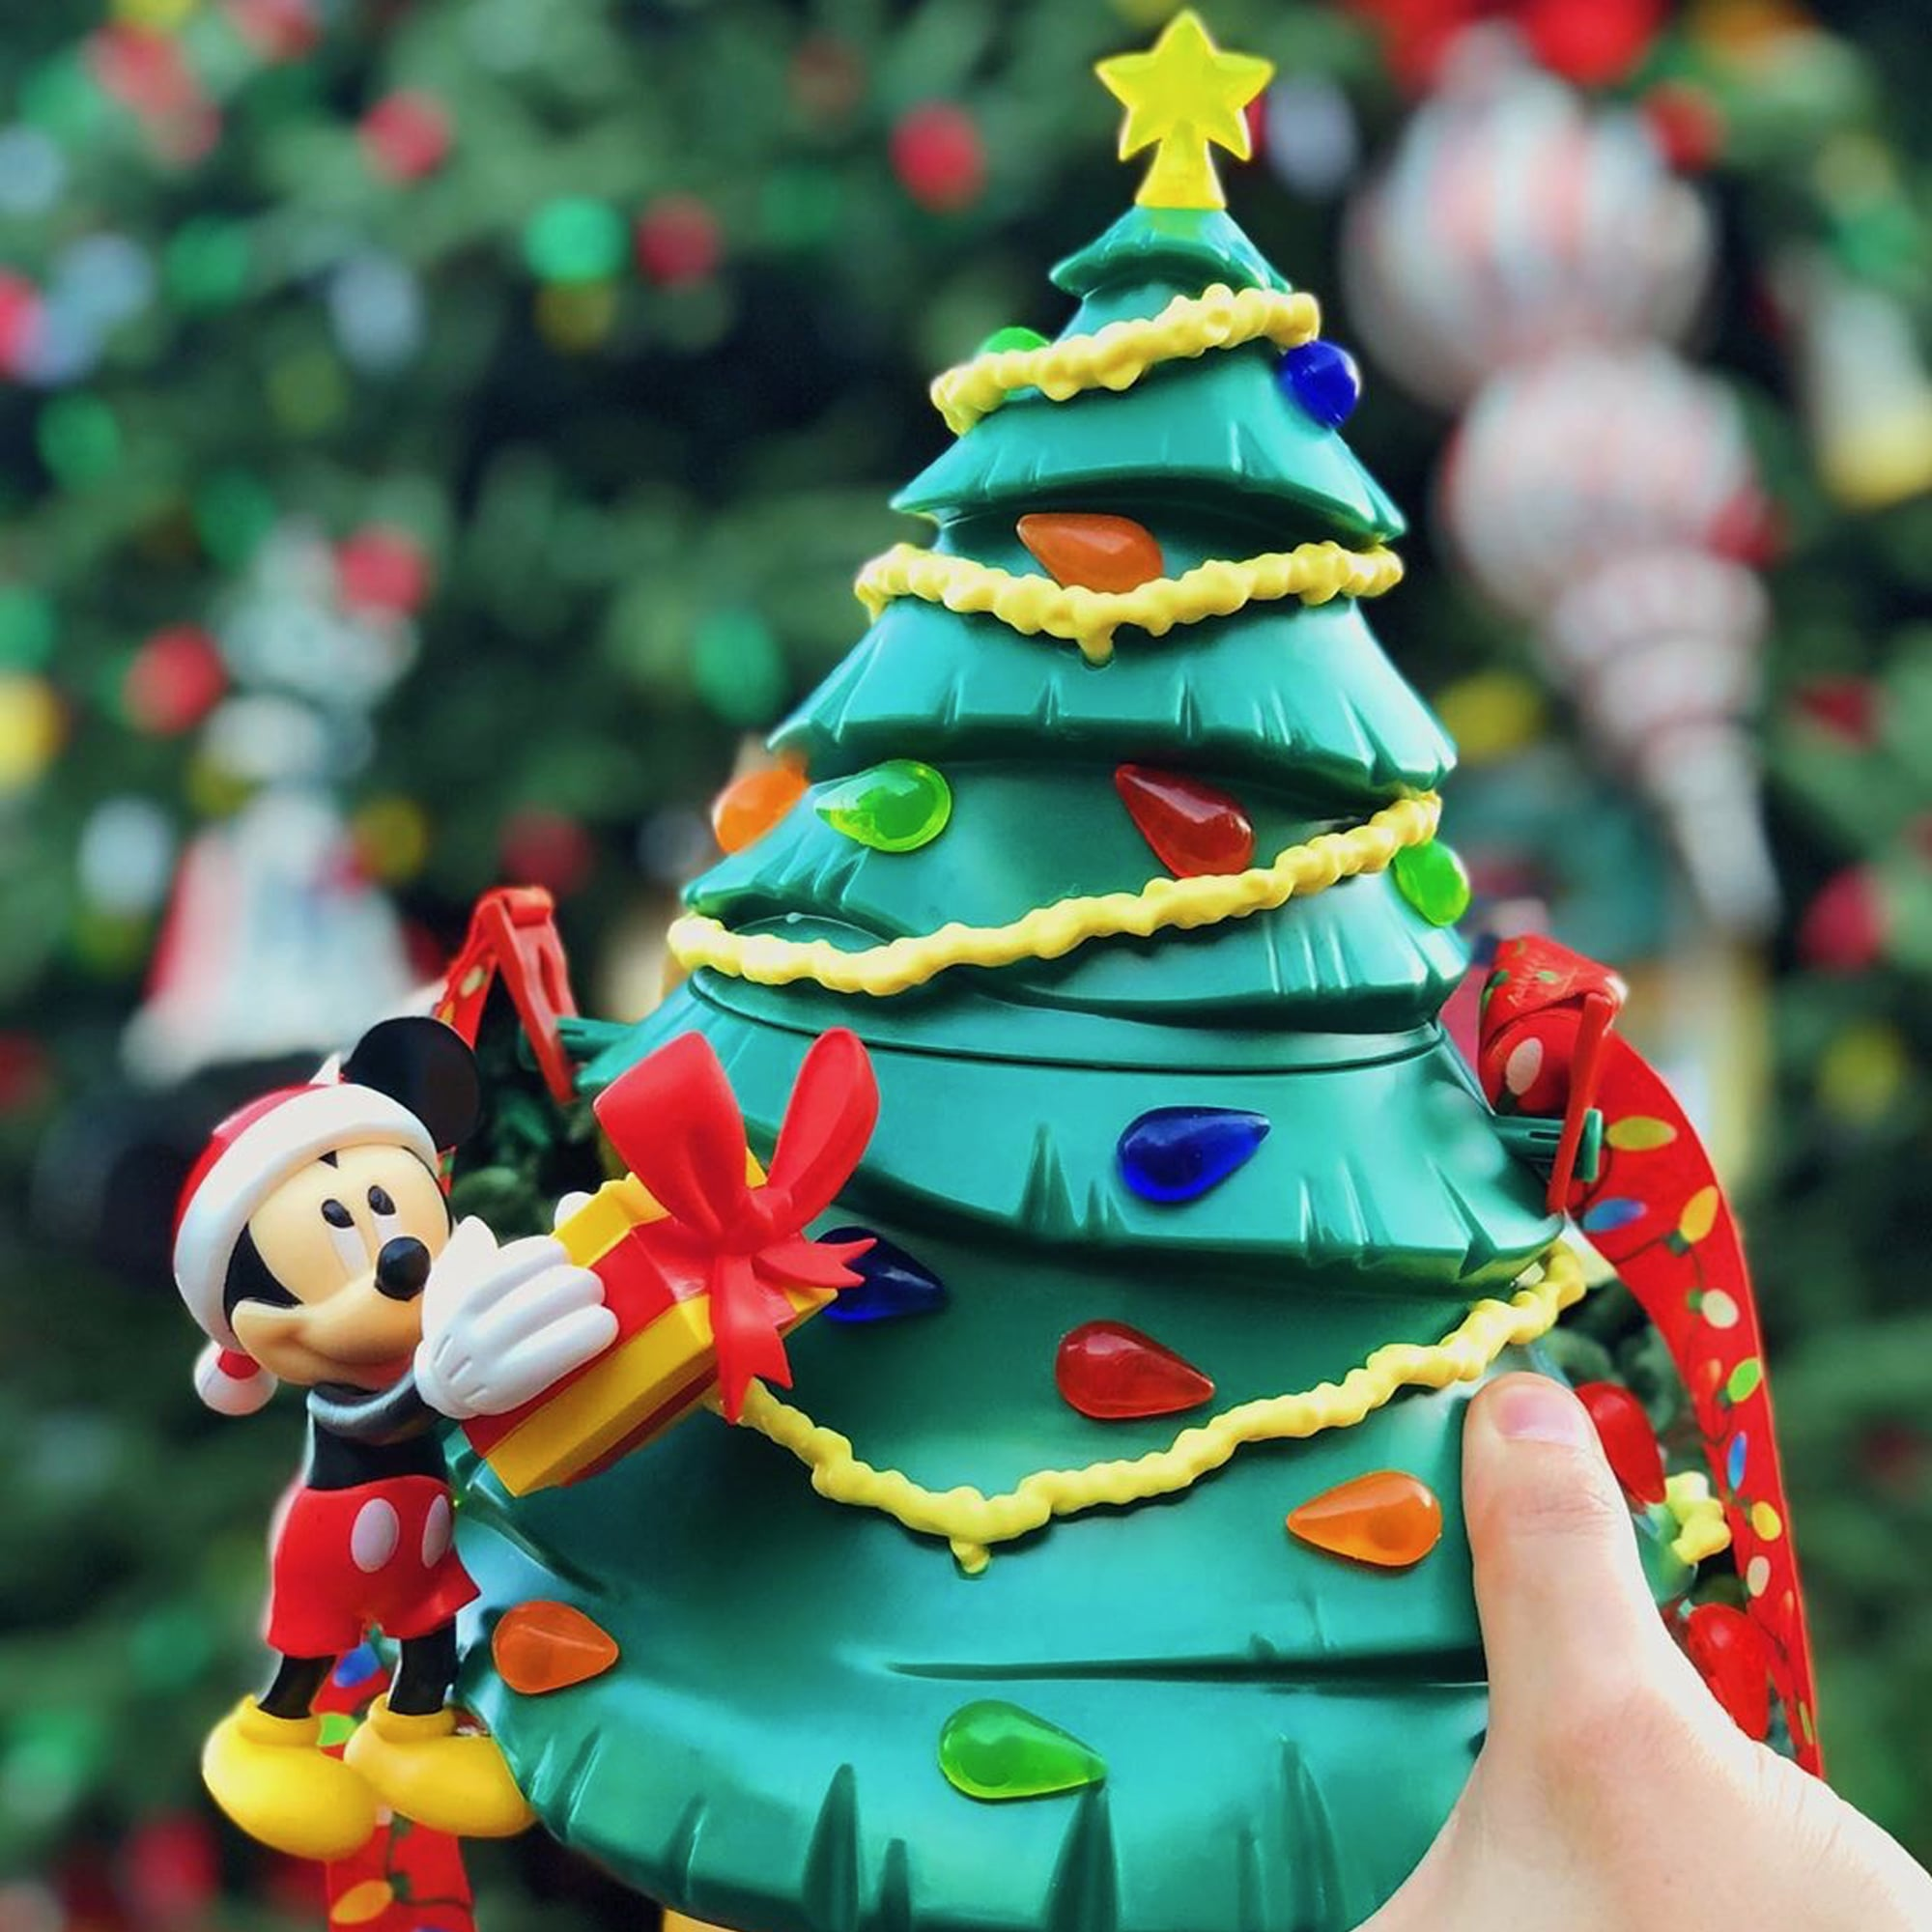 Disneyland Popcorn Bucket Christmas 2020 Disneyland's Christmas Tree Popcorn Buckets Are Going Fast